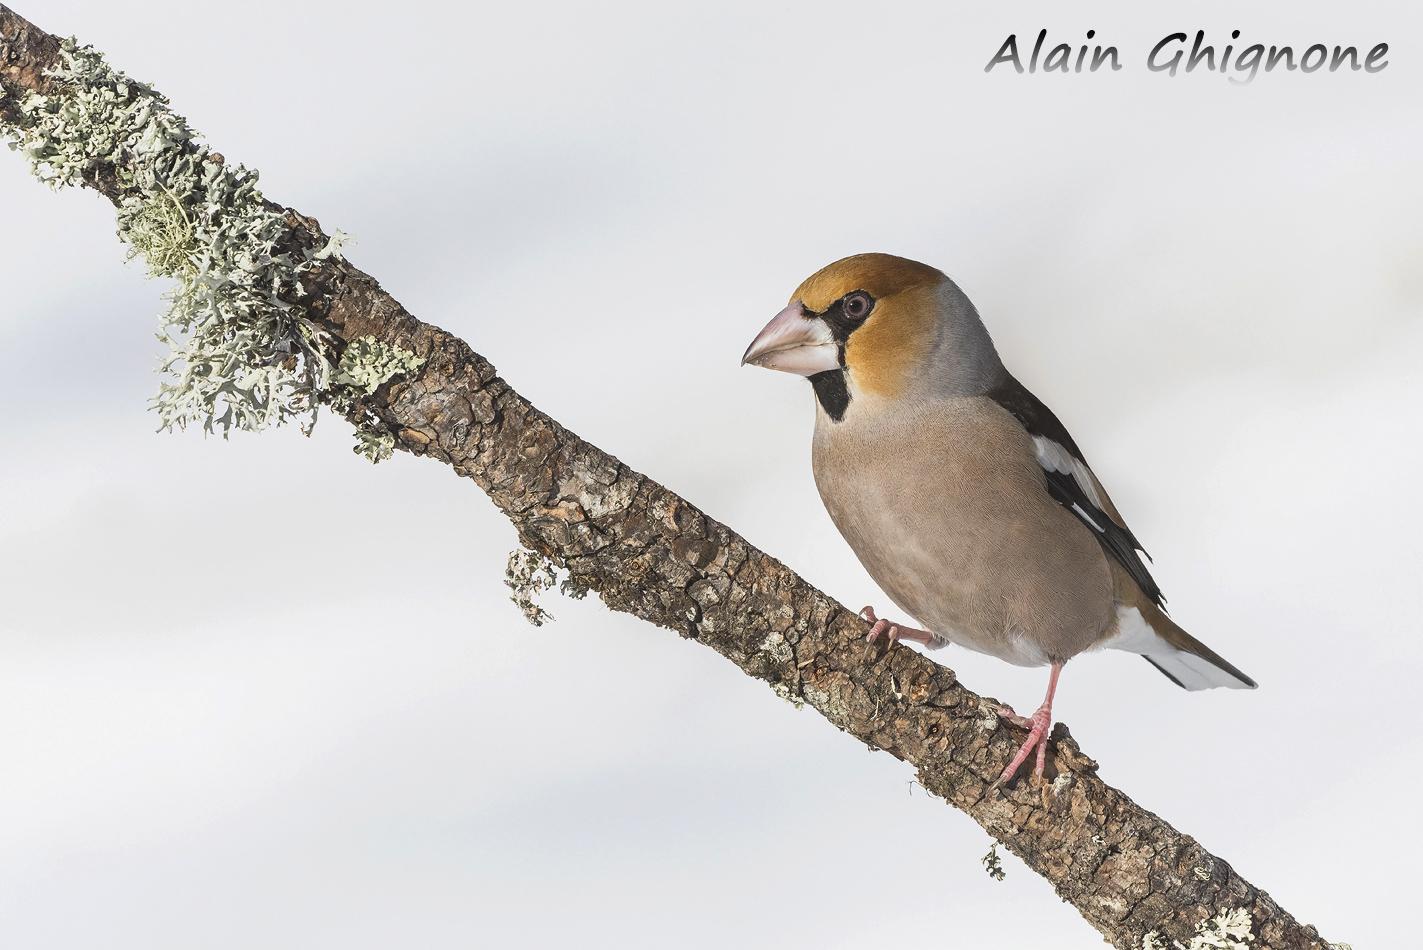 frosone posatoio neve Coccothraustes coccothraustes hawfinch